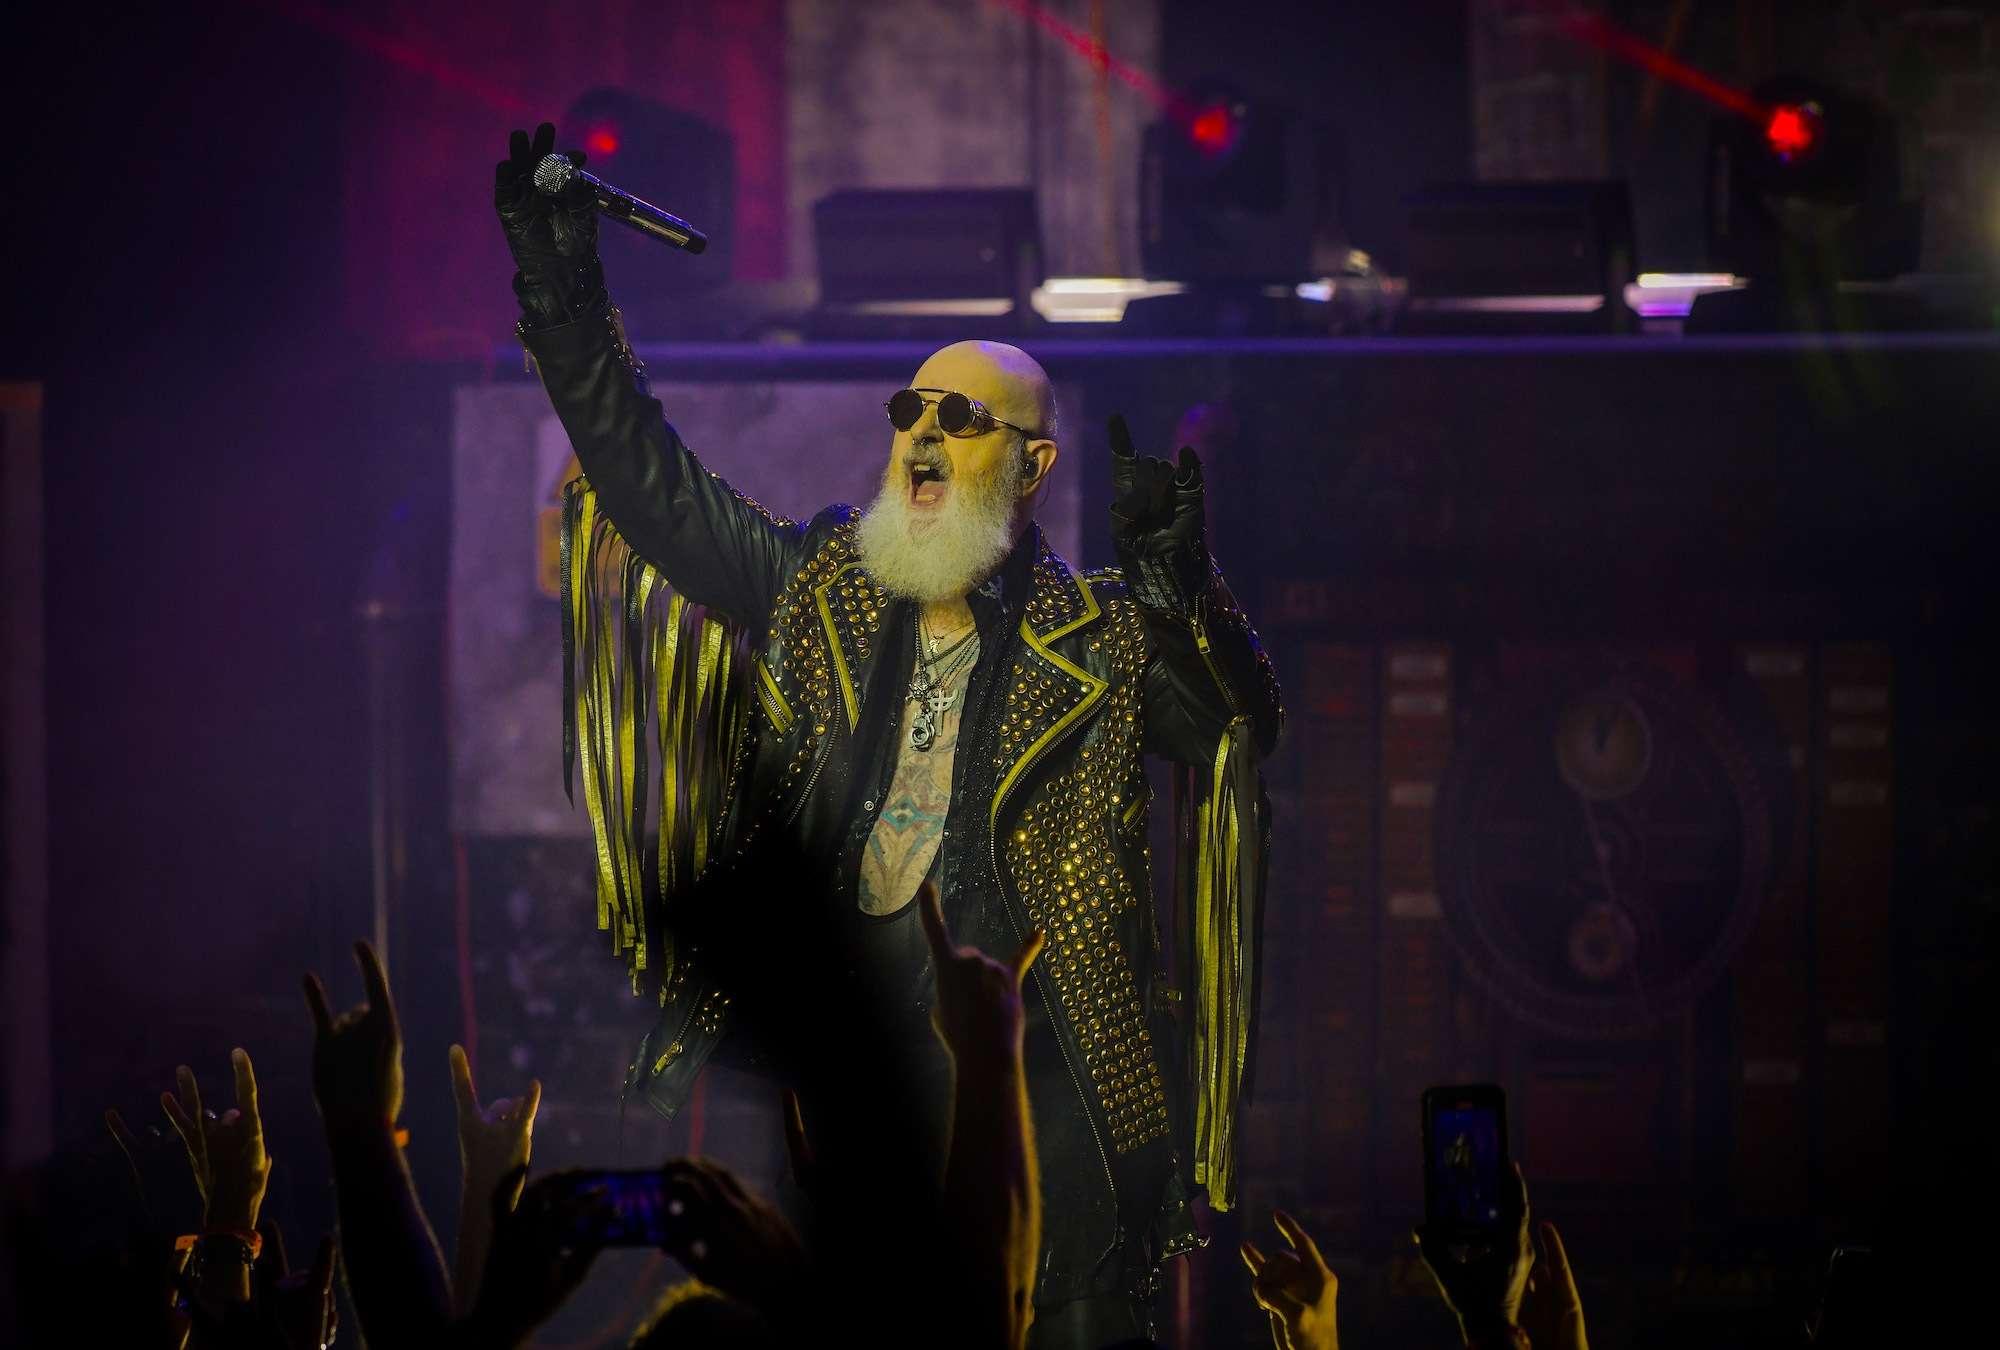 Judas Priest Live at Rosemont Theatre [GALLERY] 15